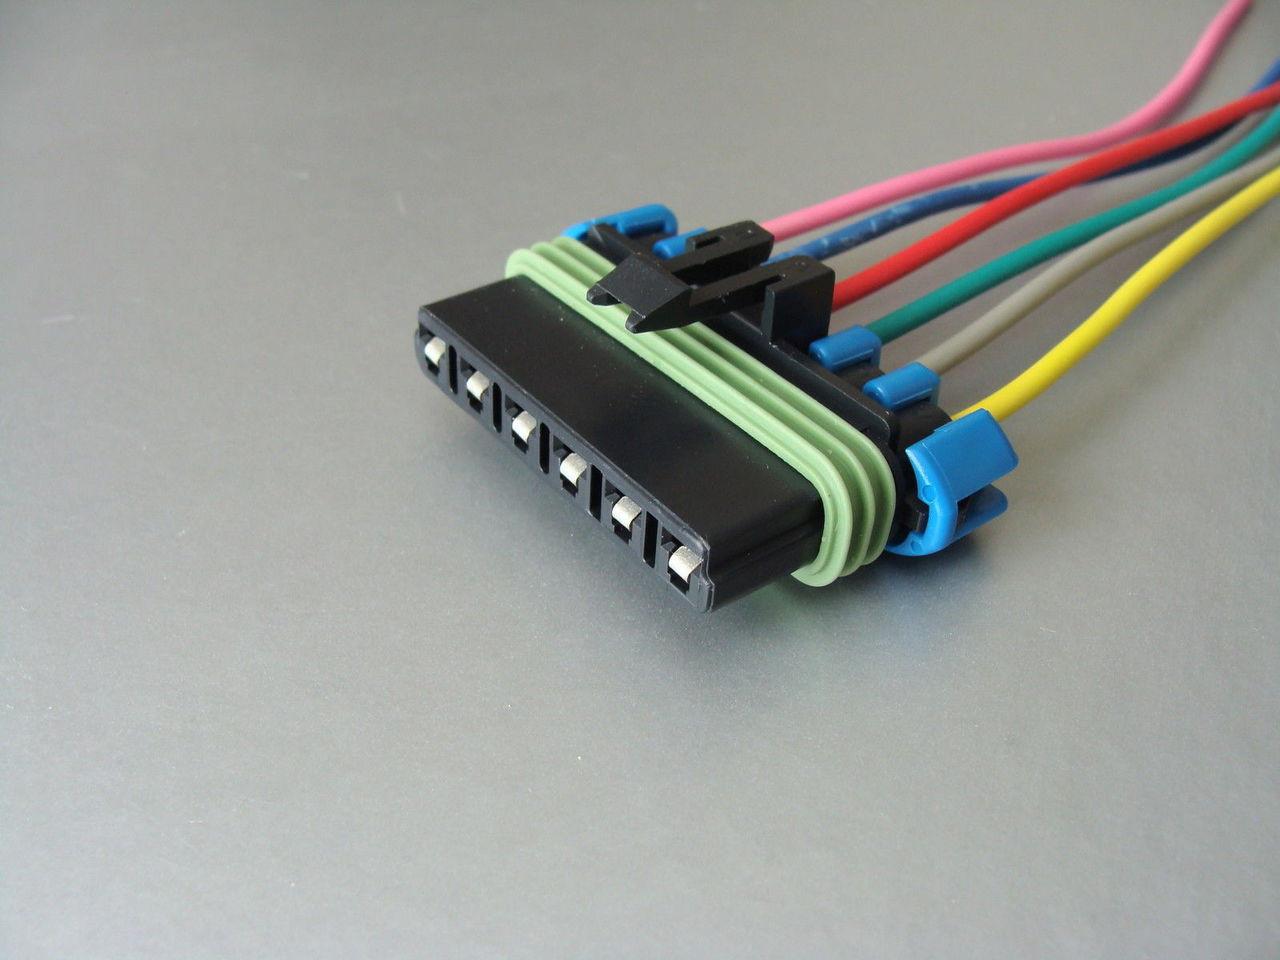 hight resolution of windshield wiper motor connector 88 92 camaro firebird image 1